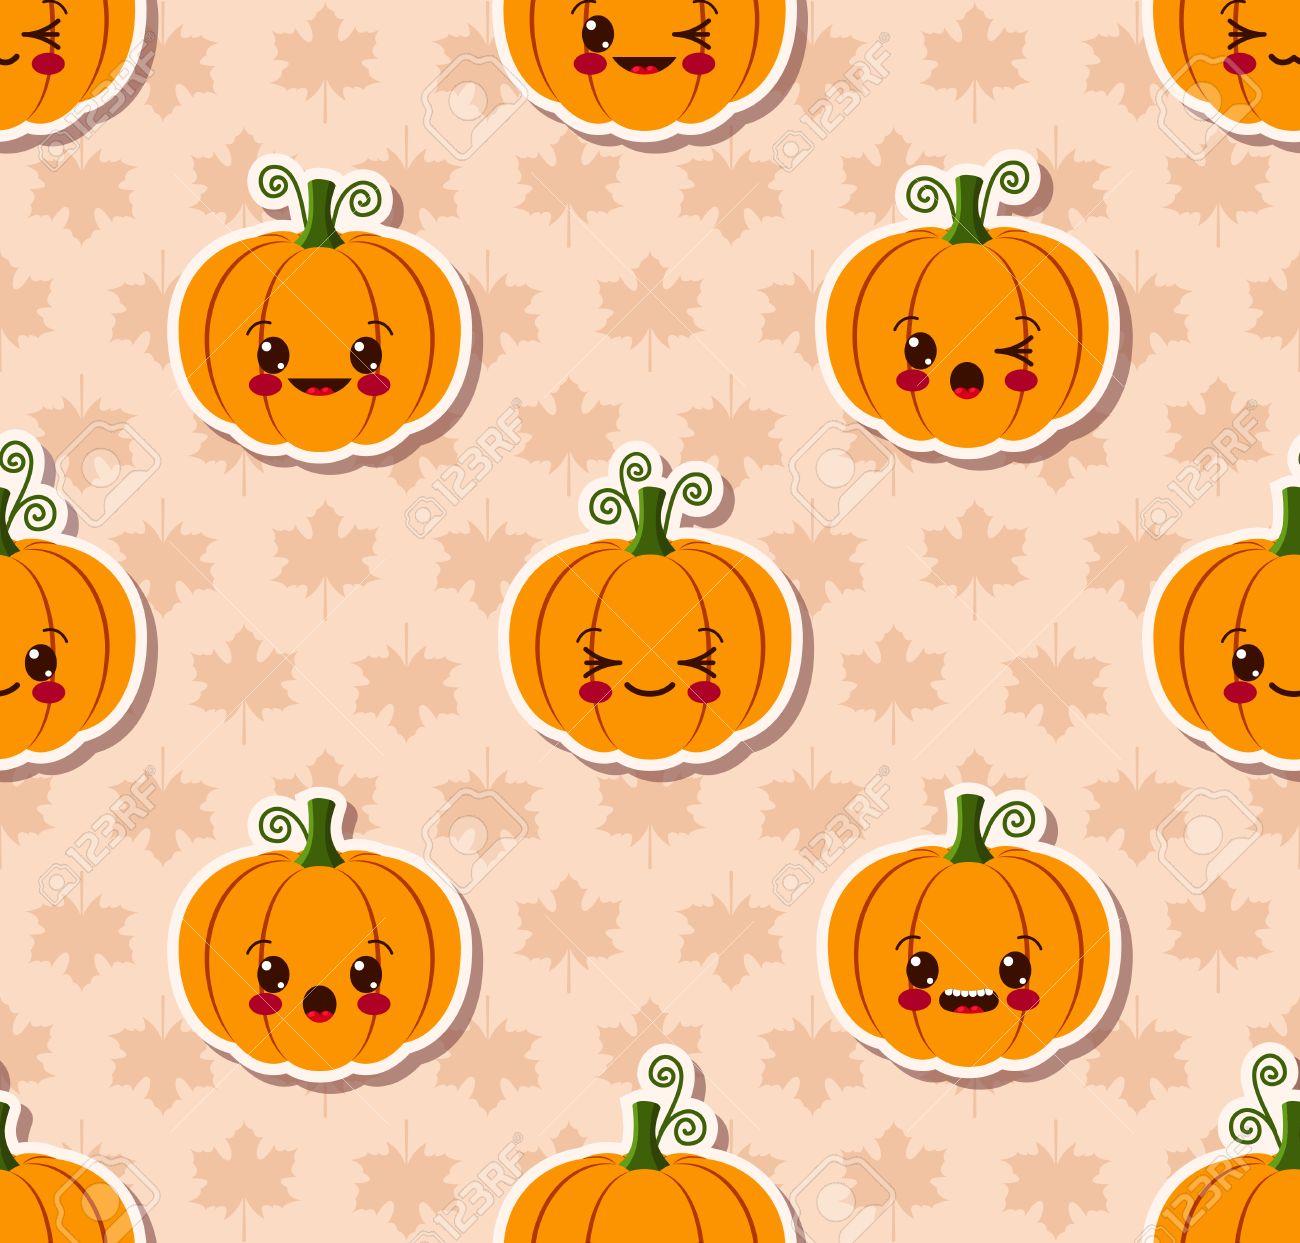 Kawaii Halloween Seamless Pattern Royalty Free Cliparts, Vectors ...